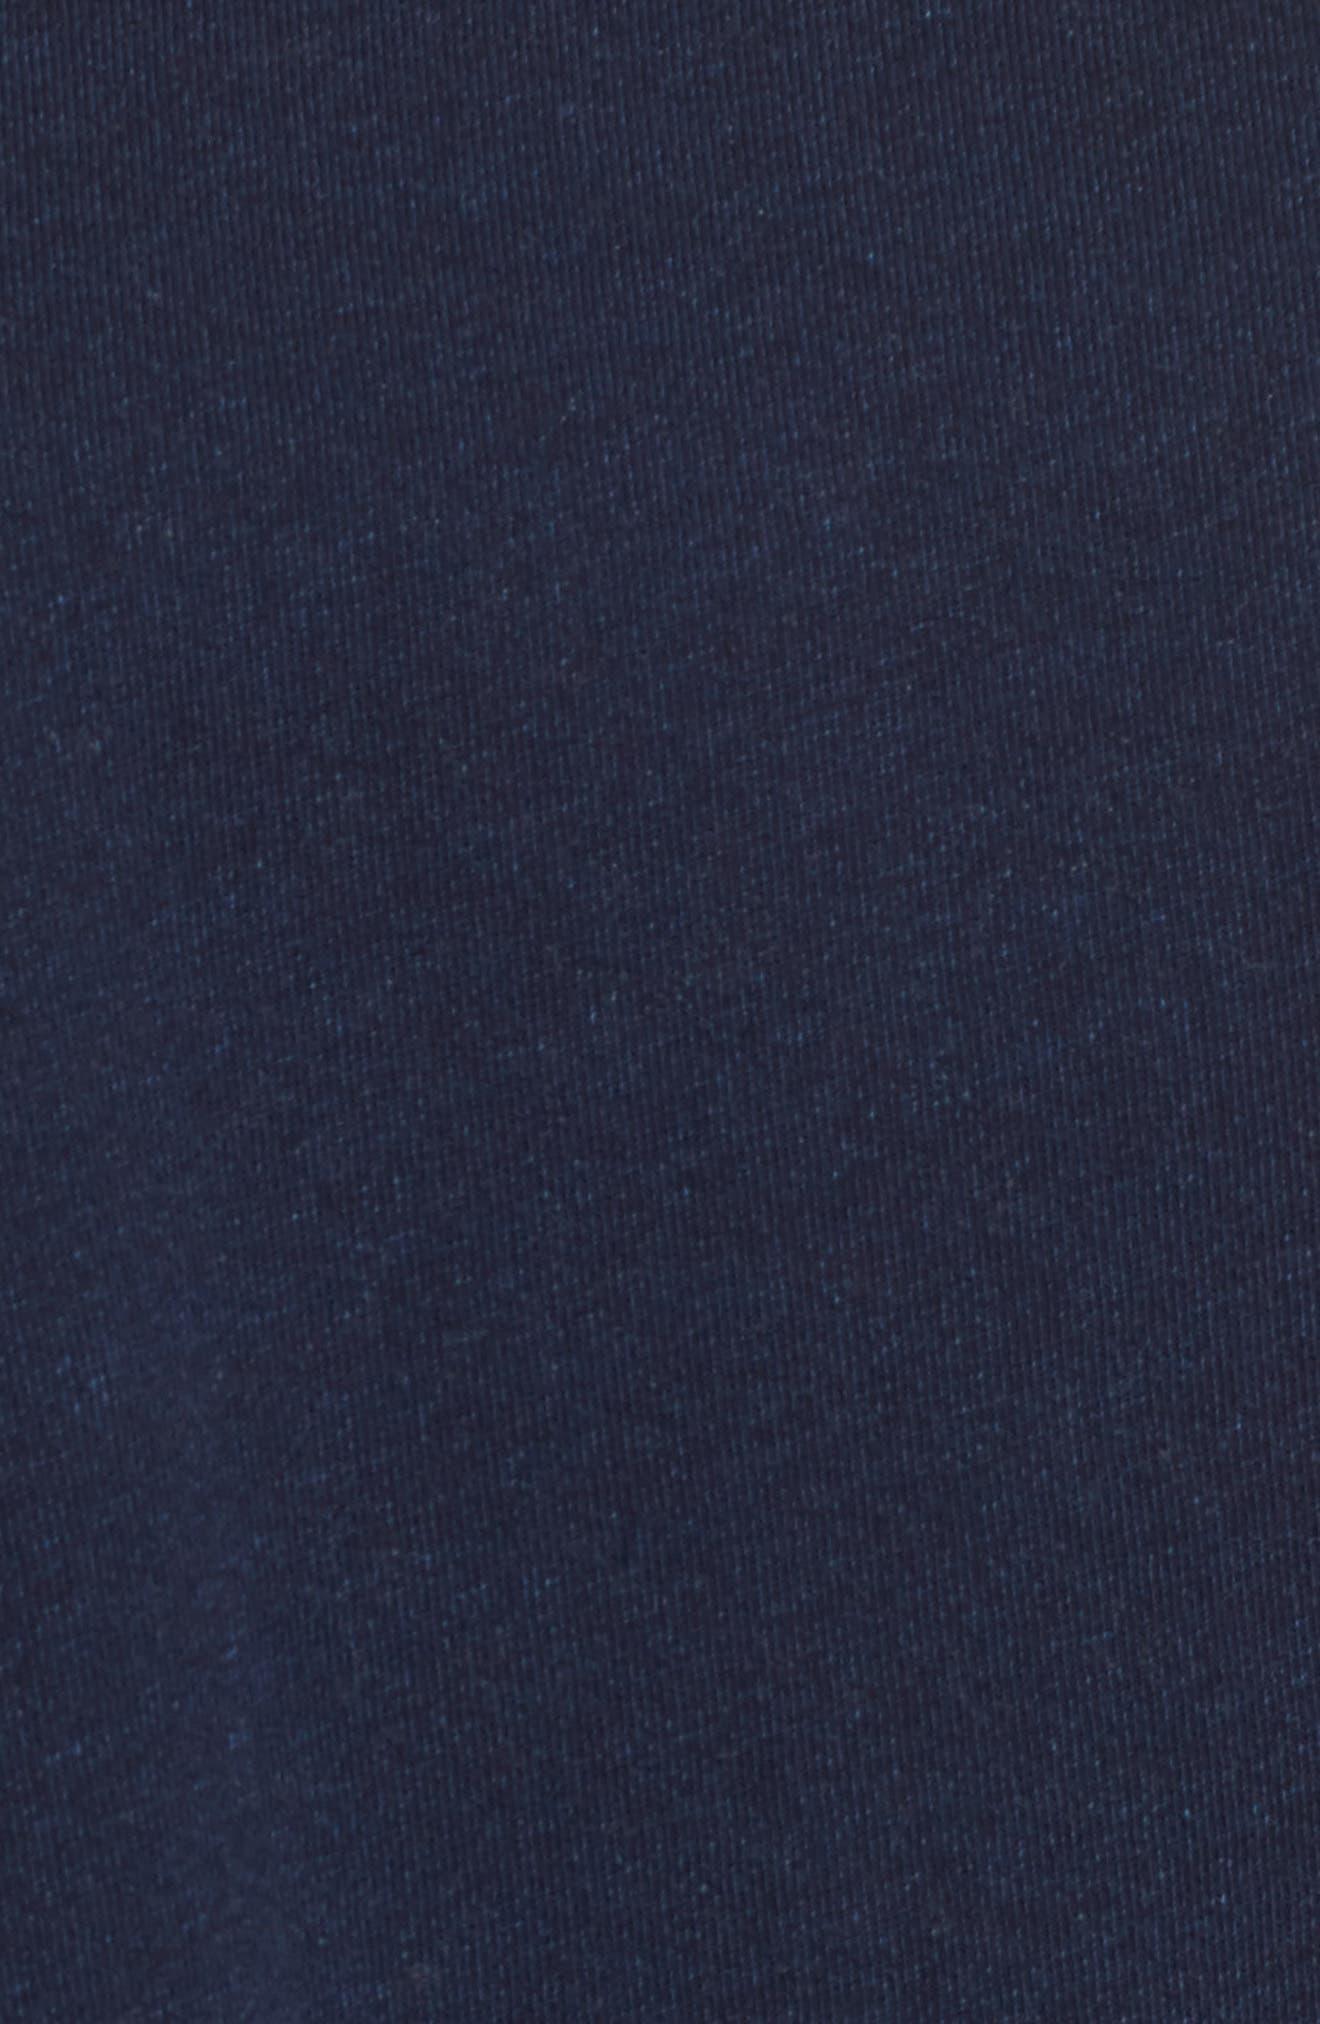 Pearl Ruffle Sweatshirt,                             Alternate thumbnail 5, color,                             Dark Indigo